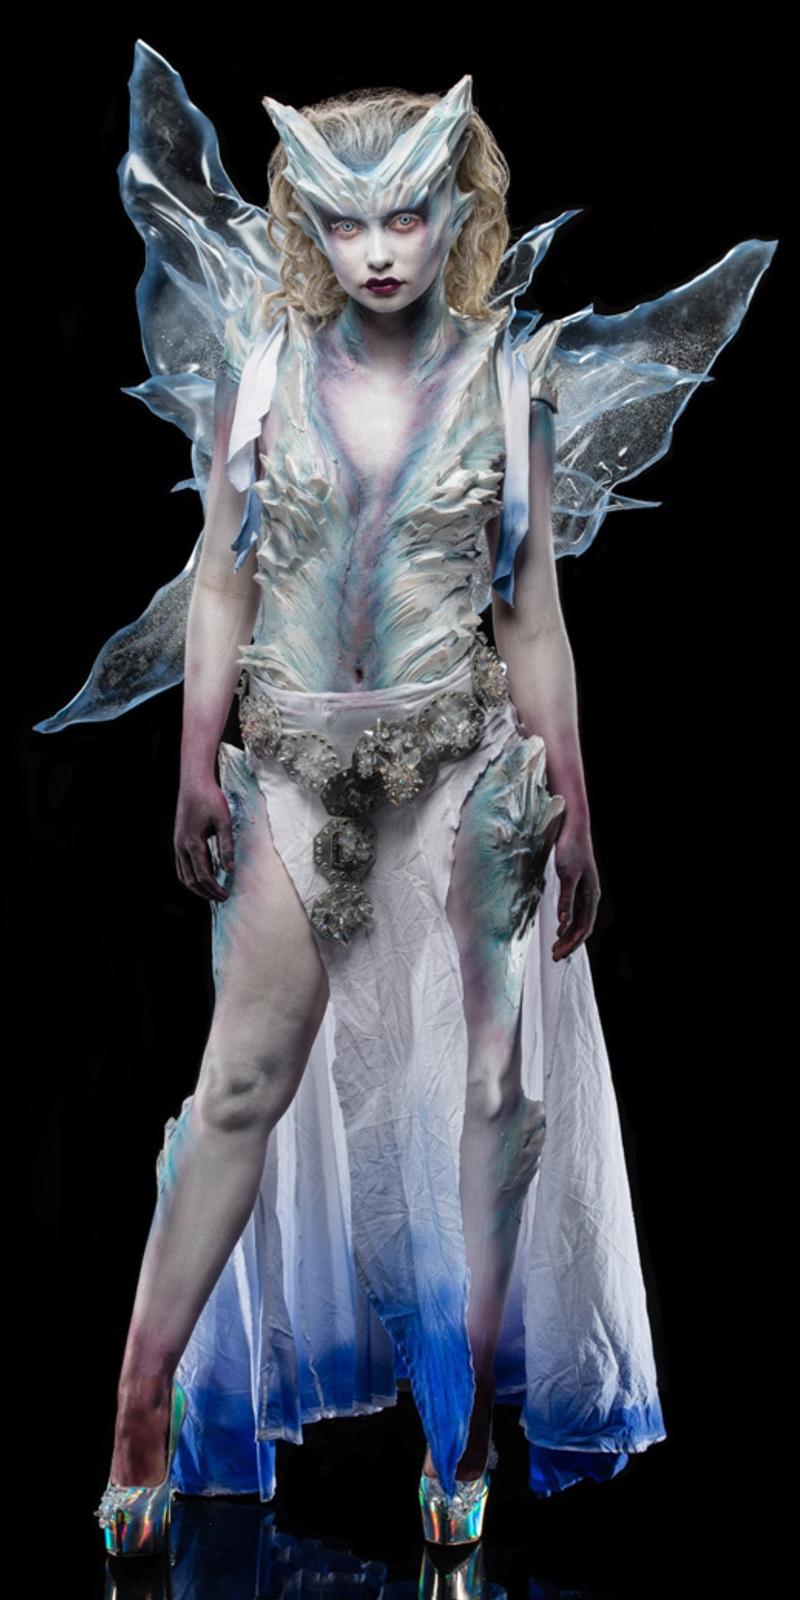 ika_Avalanche Fairy | Non-alien Creatures Wiki | Fandom